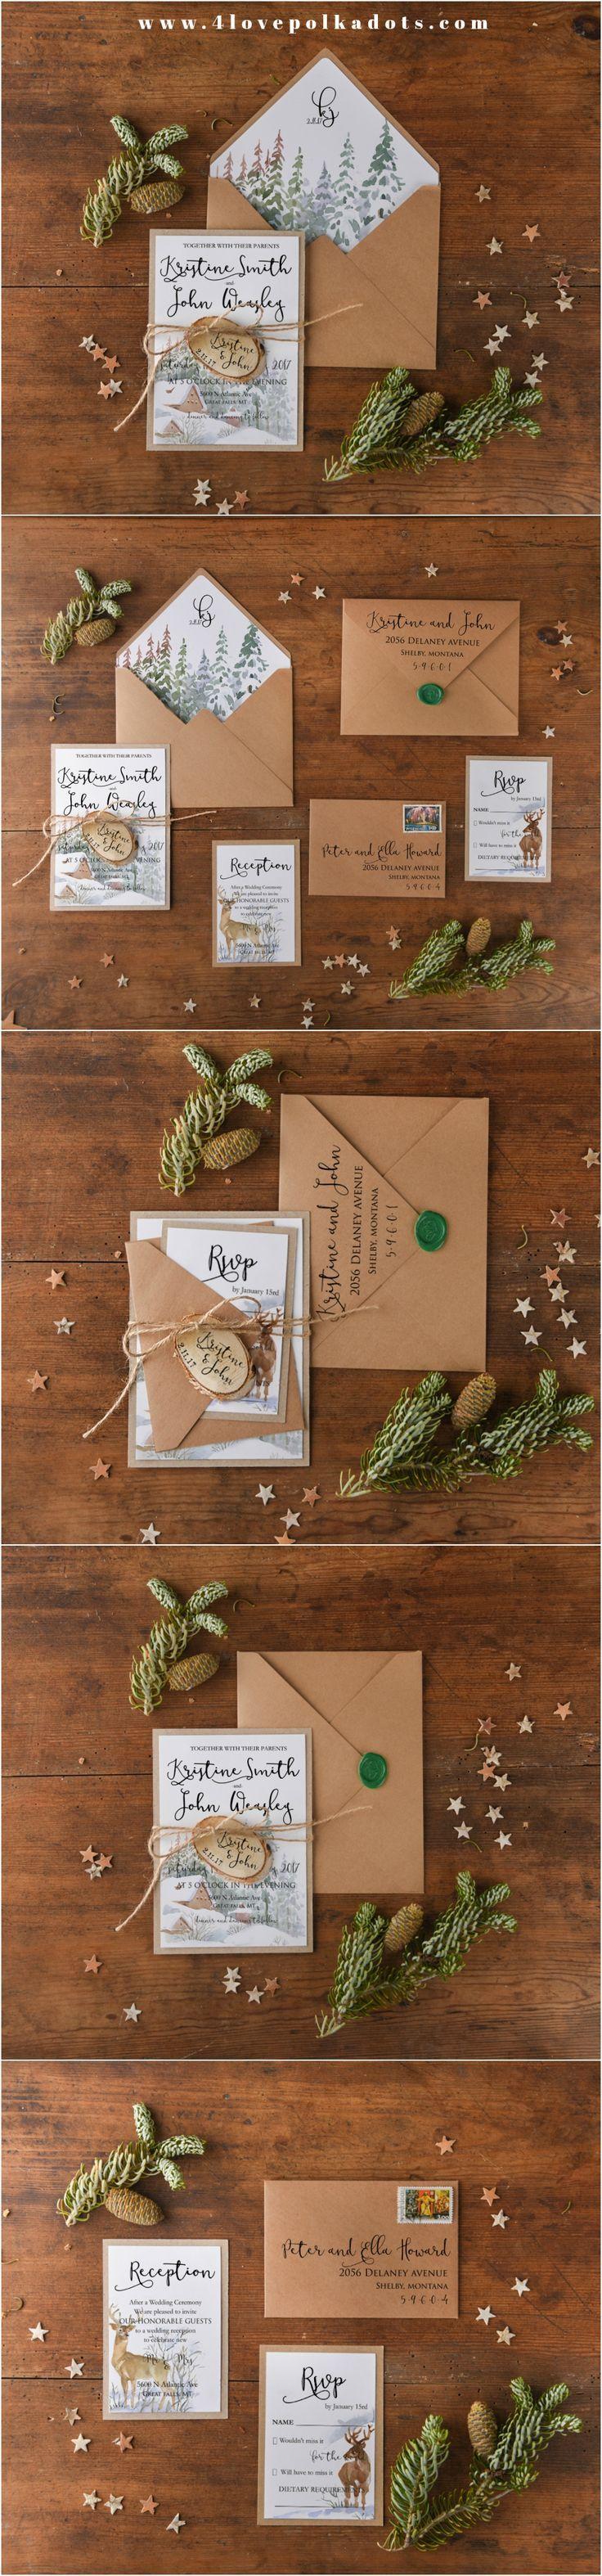 Rustic Kraft Paper Winter Wedding Invitations with wooden tag #rustic #whimsical #winterwedding #romanticwedding